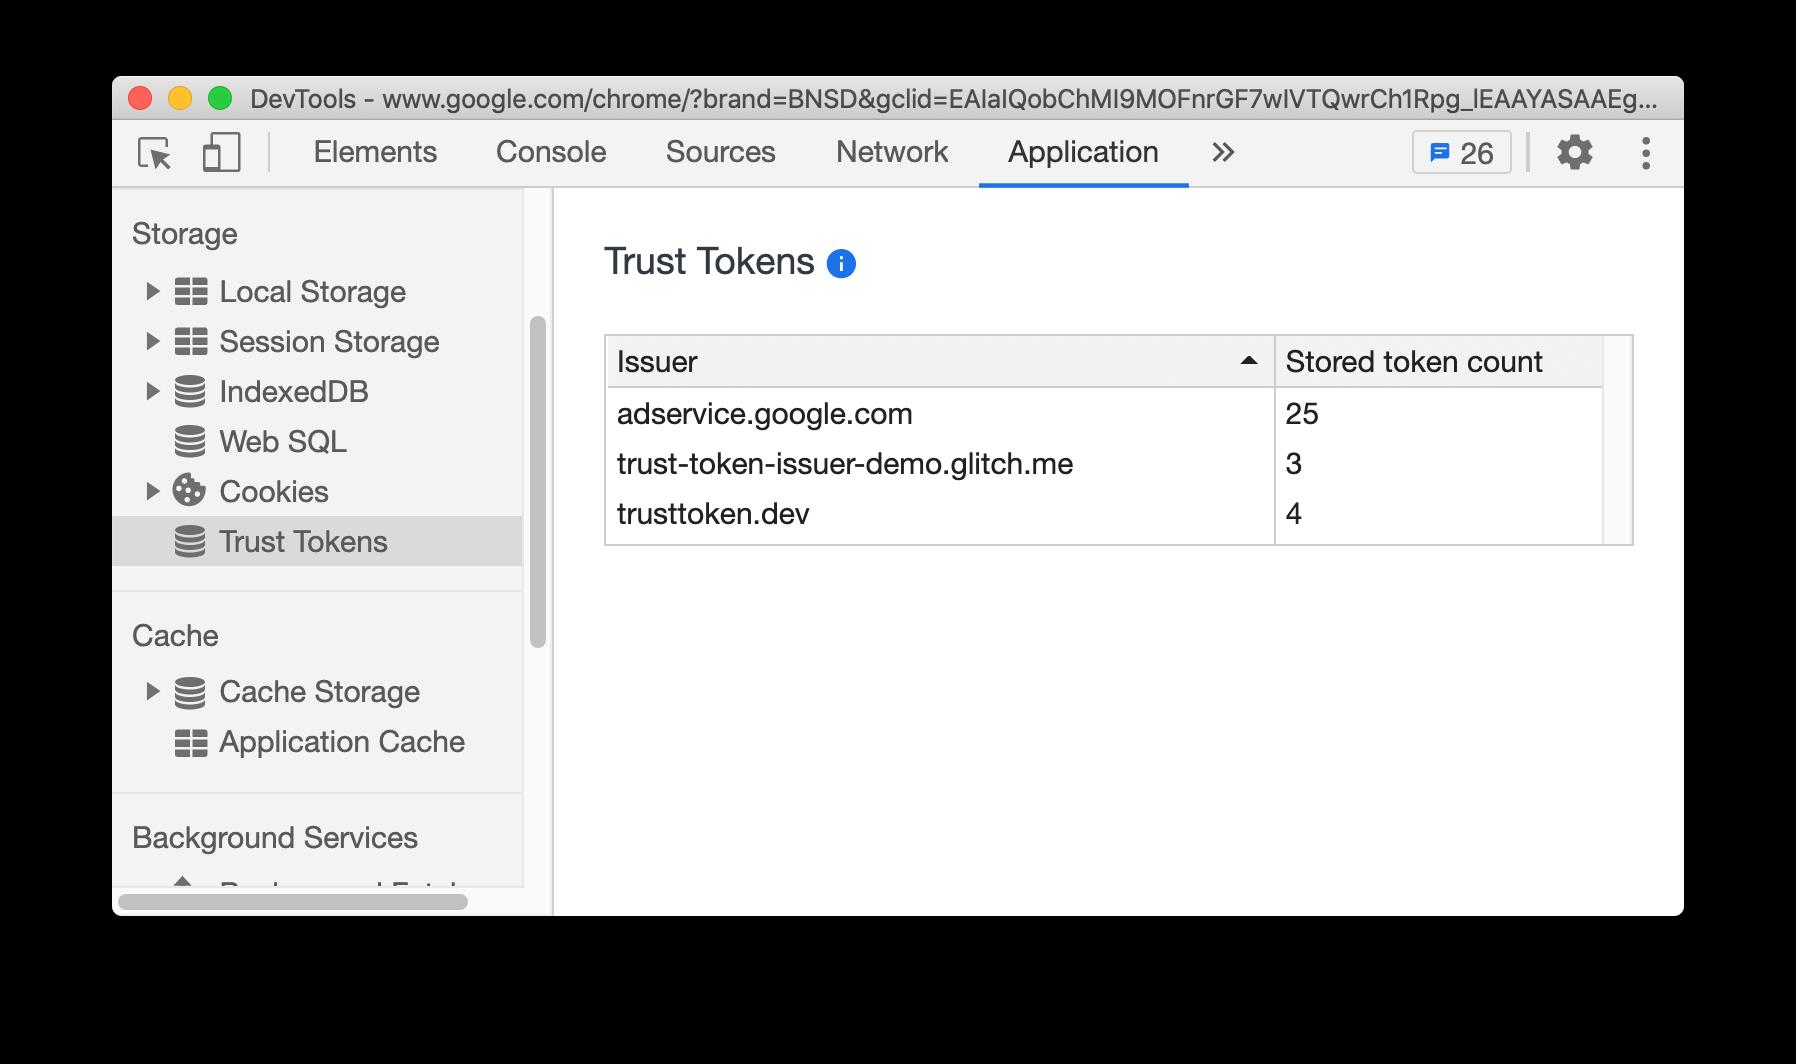 New Trust Tokens pane